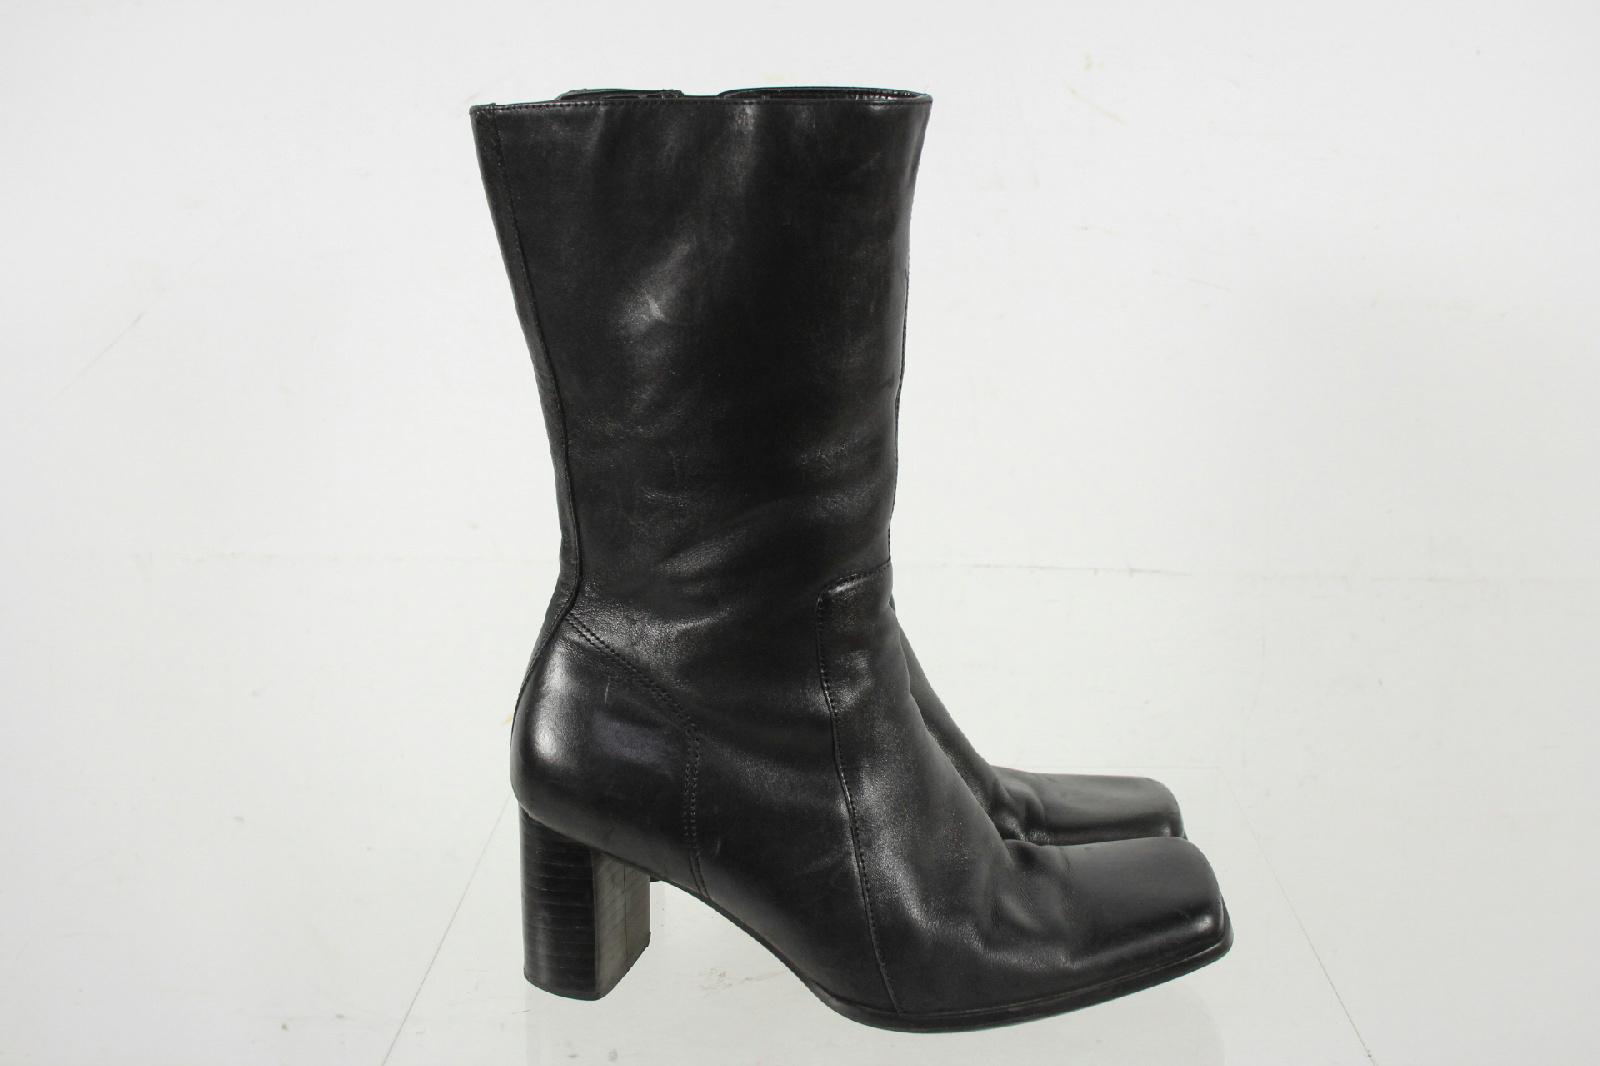 nine west black leather square toe block heel zip mid calf